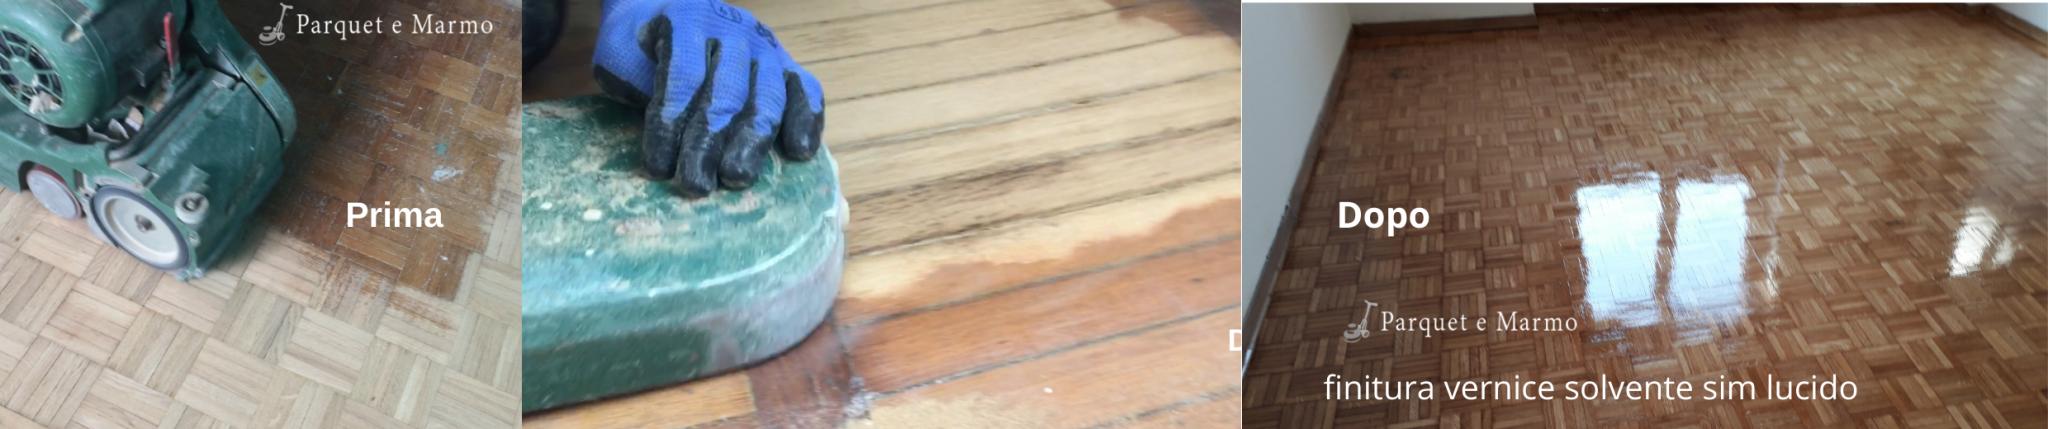 finitura vernice solvente sim lucido